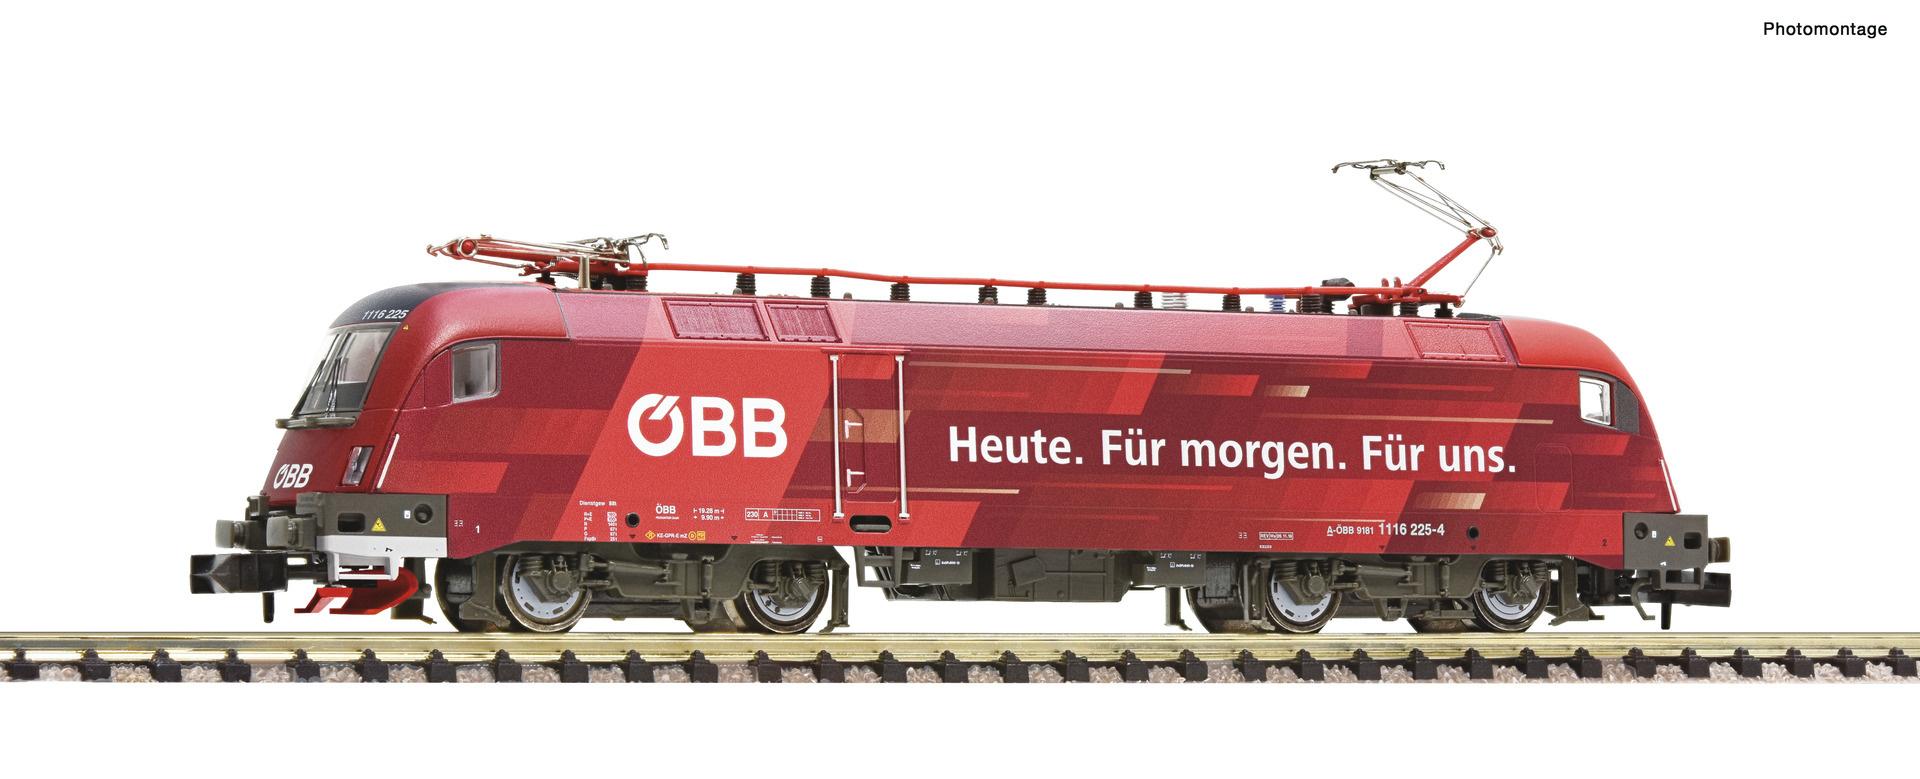 "781773 E-Lok 1116 225-4 SND.""Heute ...-1"